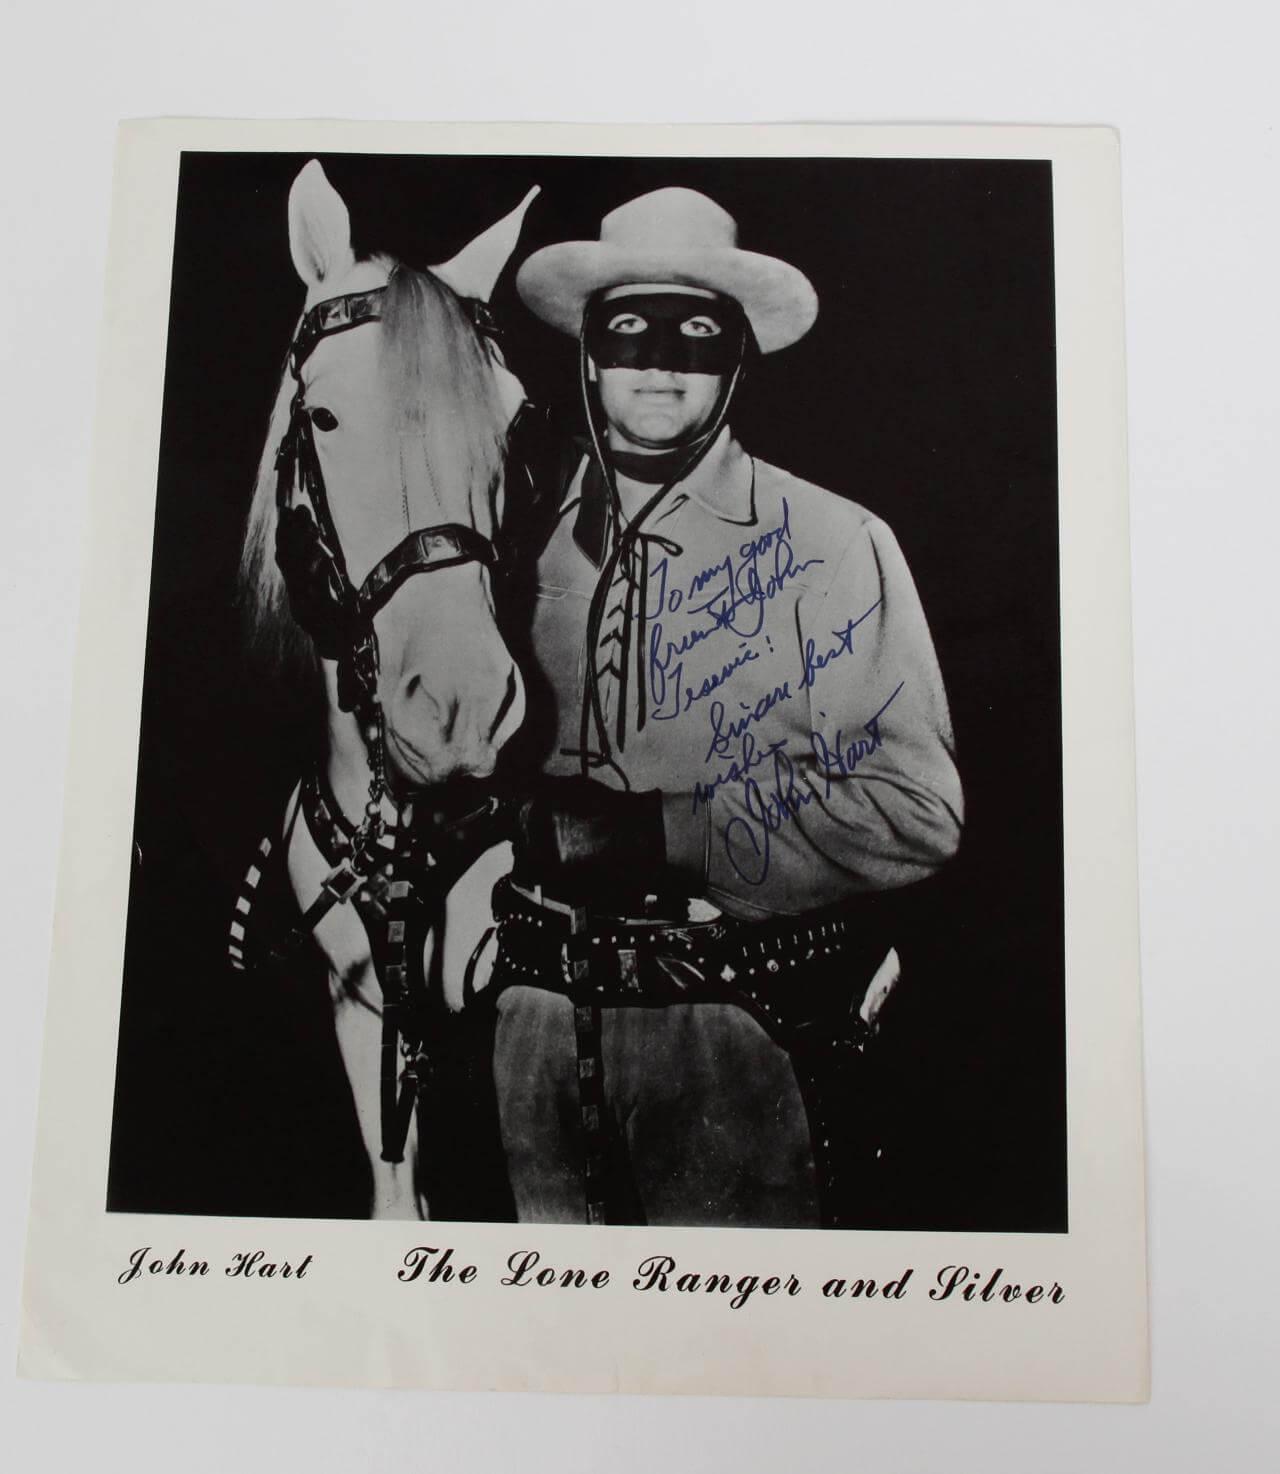 Lash Larue John Hart Signed Photos The Lone Ranger Coa Jsa